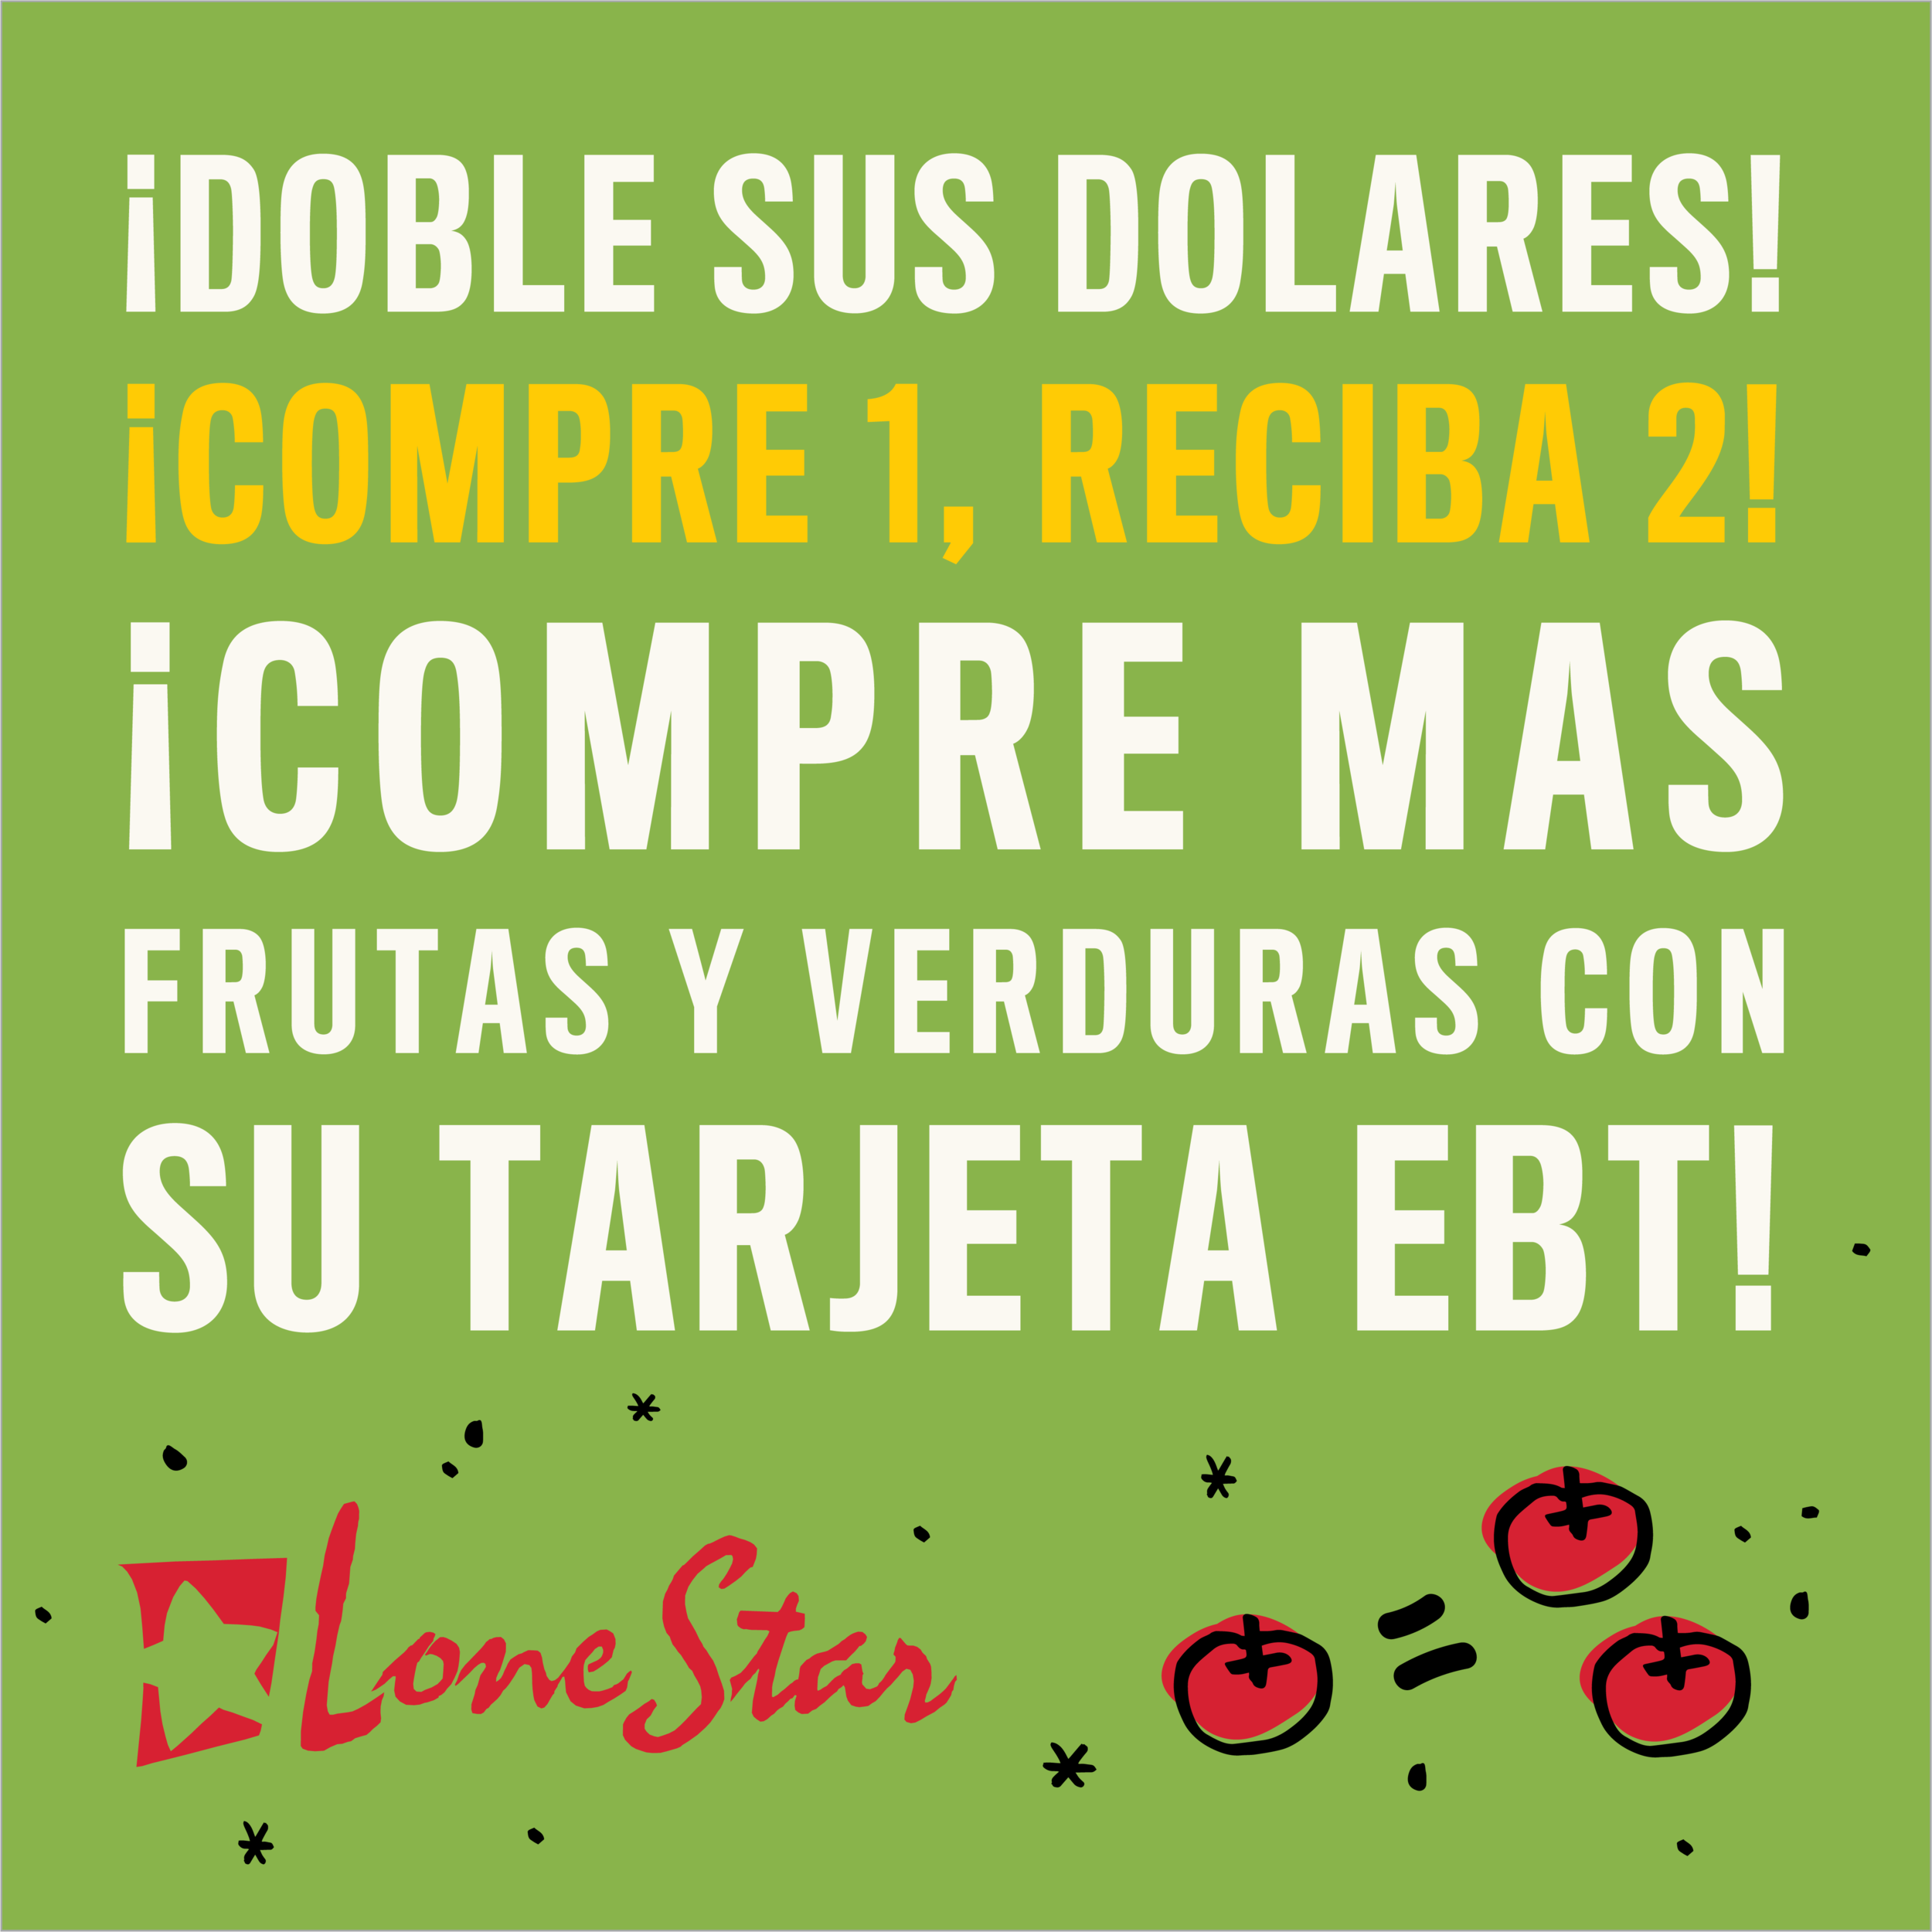 GLM-3-insta-EBT-11-spanish-11.png